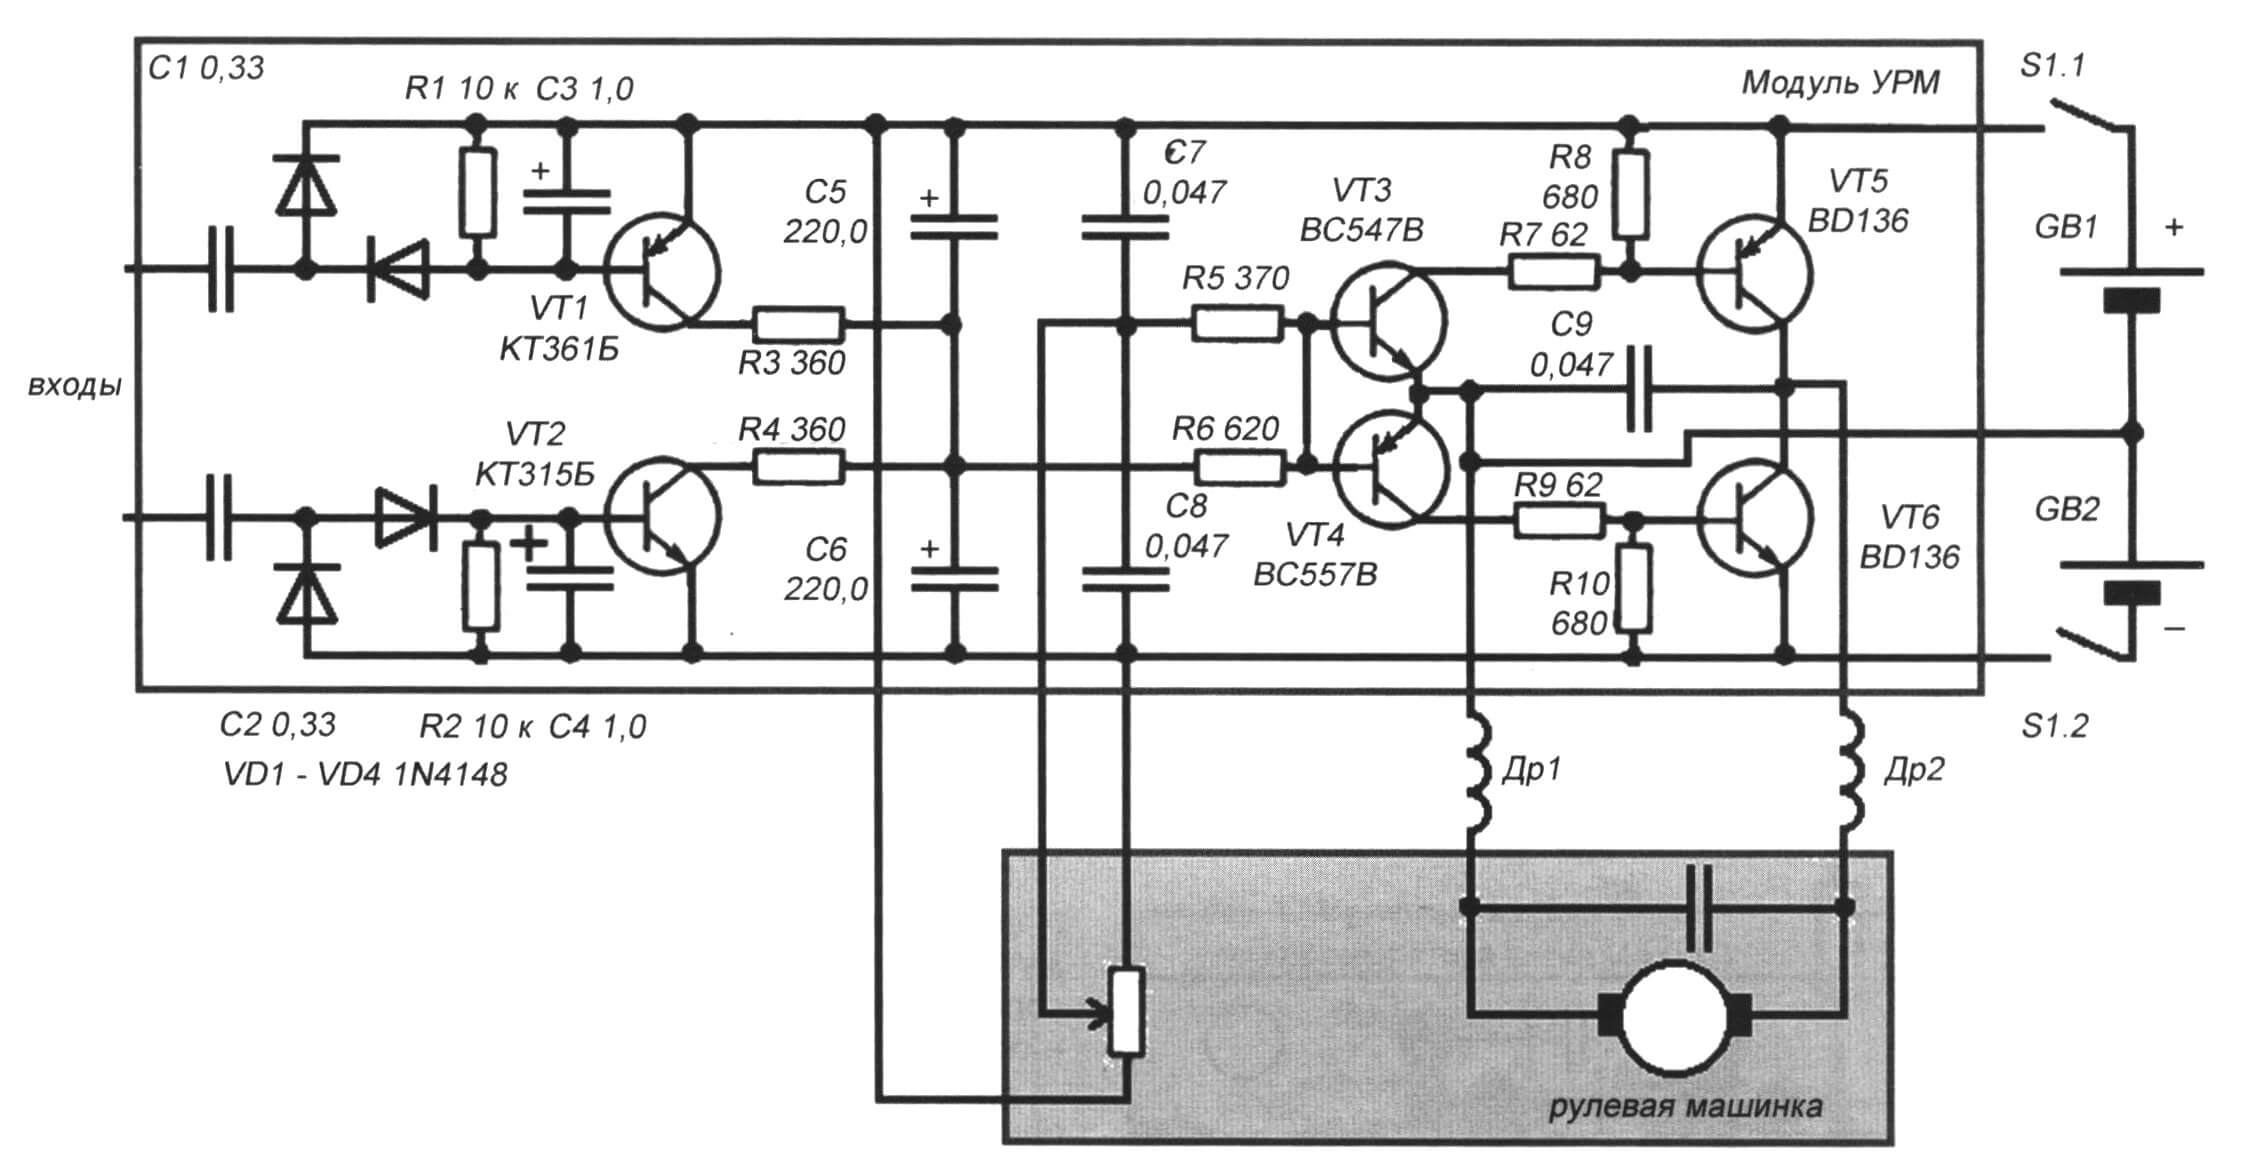 Рис. 4. Принципиальная схема модуля УРМ